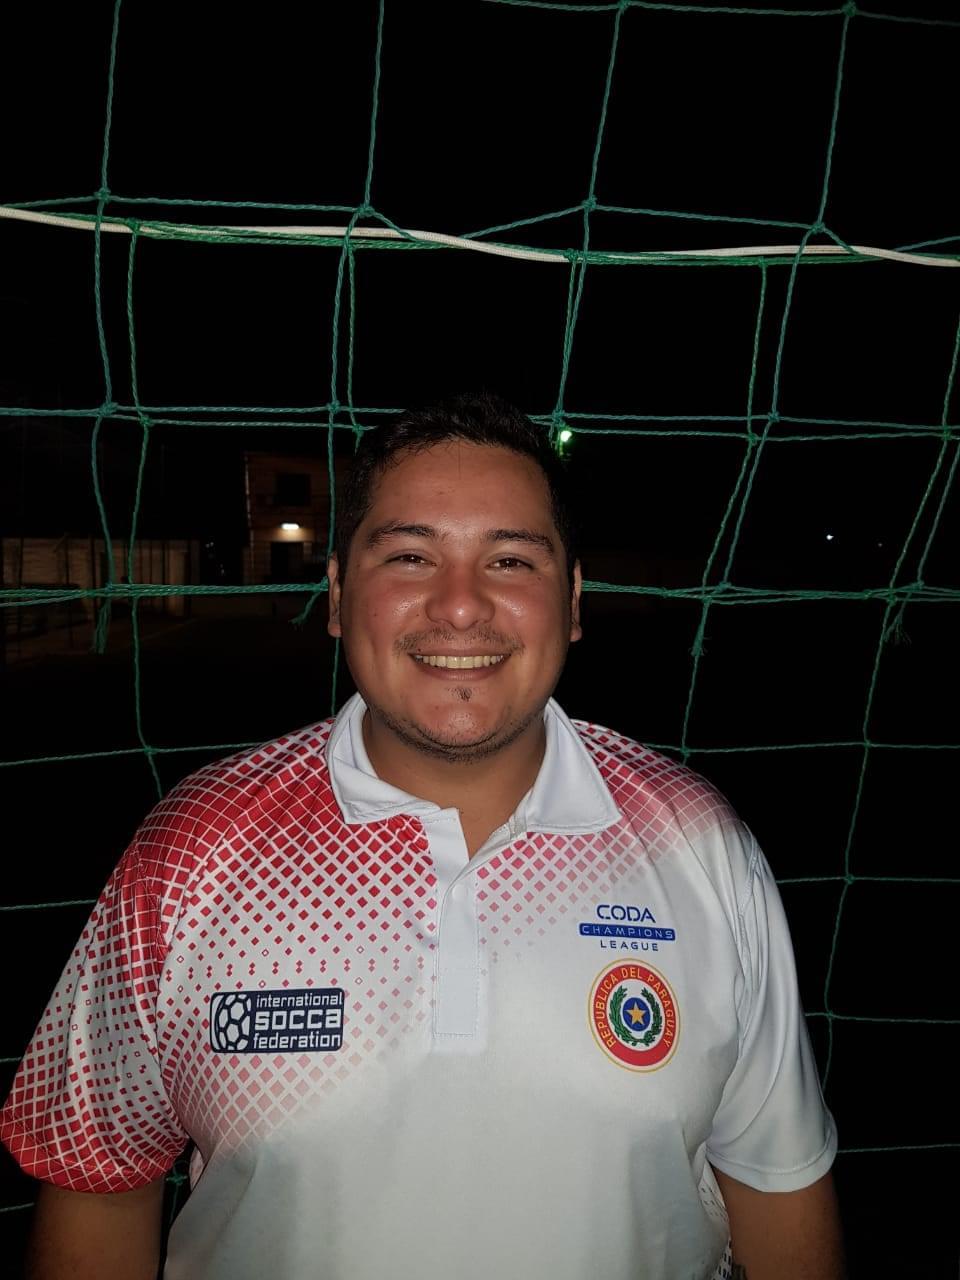 Ivan Rene Marecos Lopez